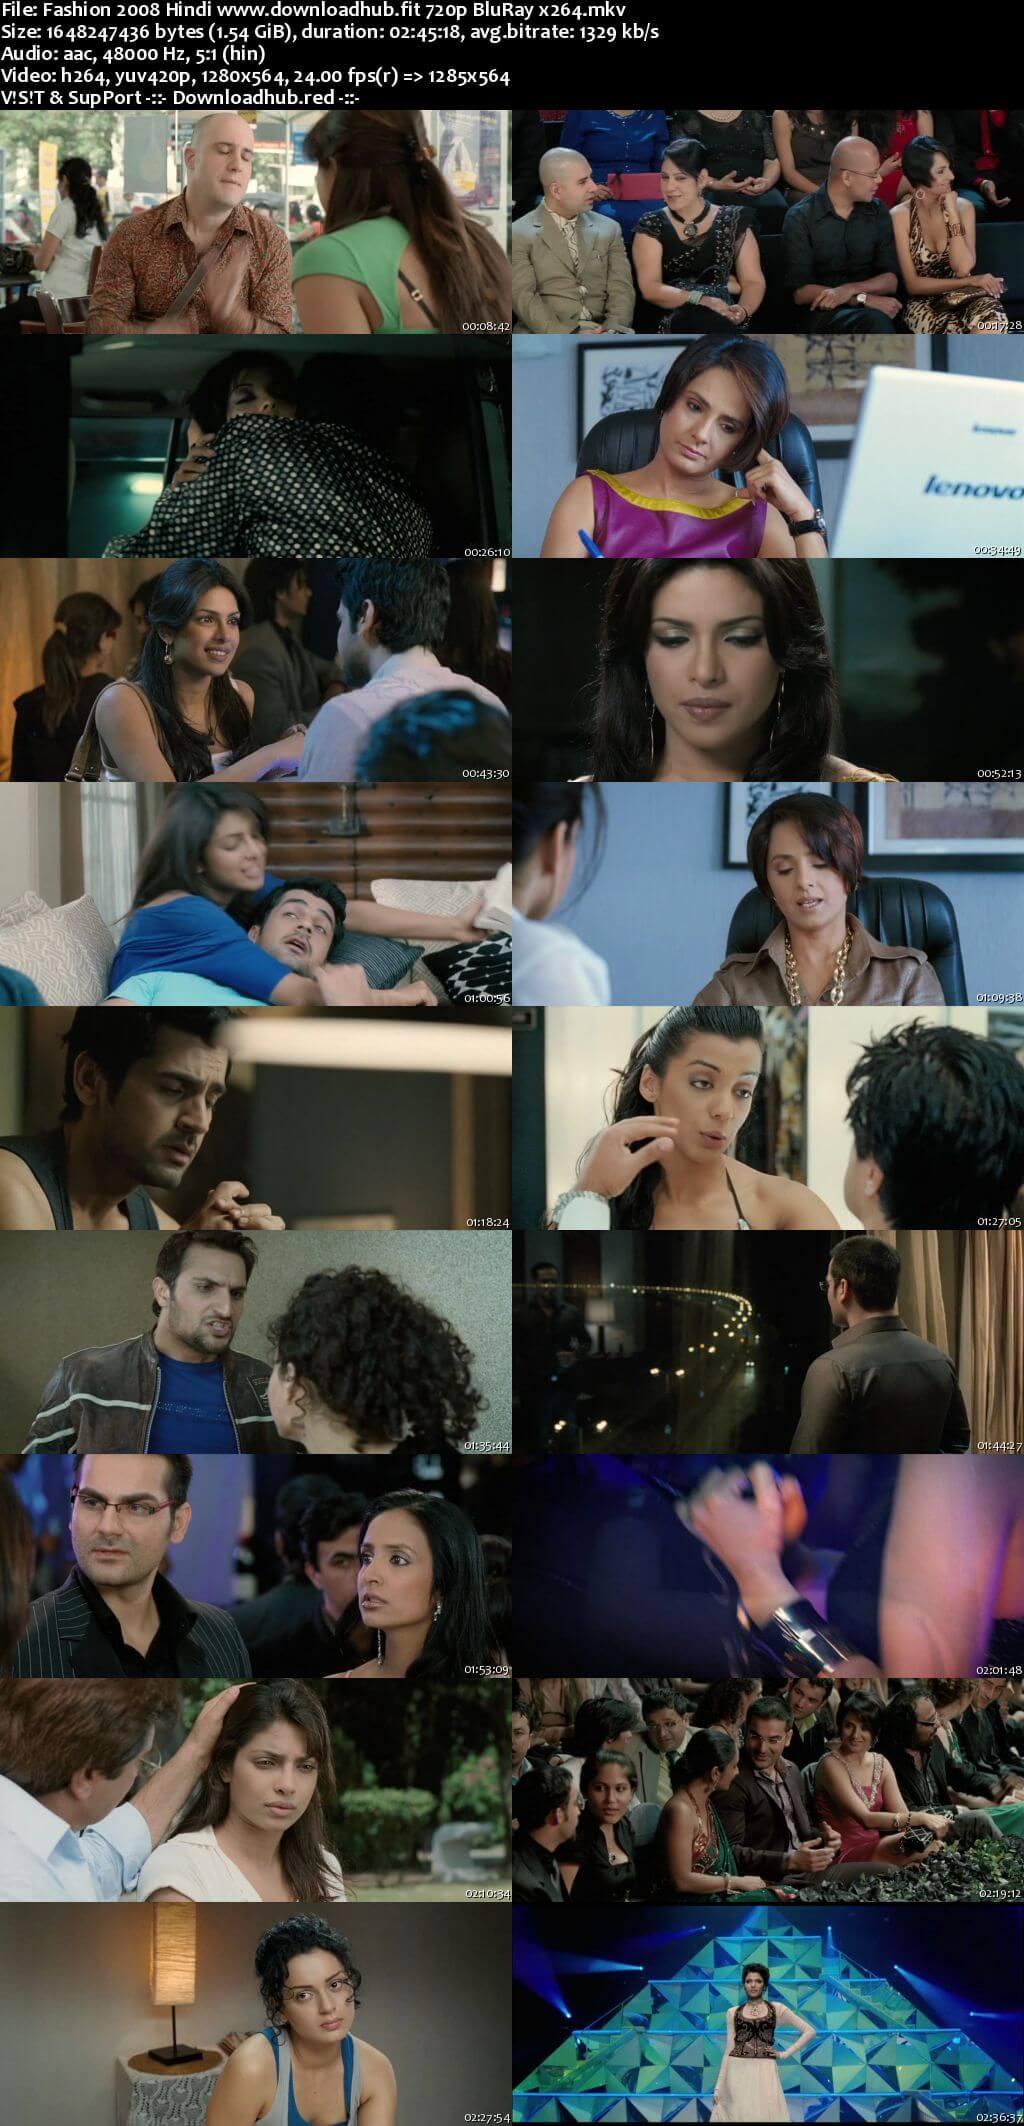 Fashion 2008 Hindi 720p BluRay x264